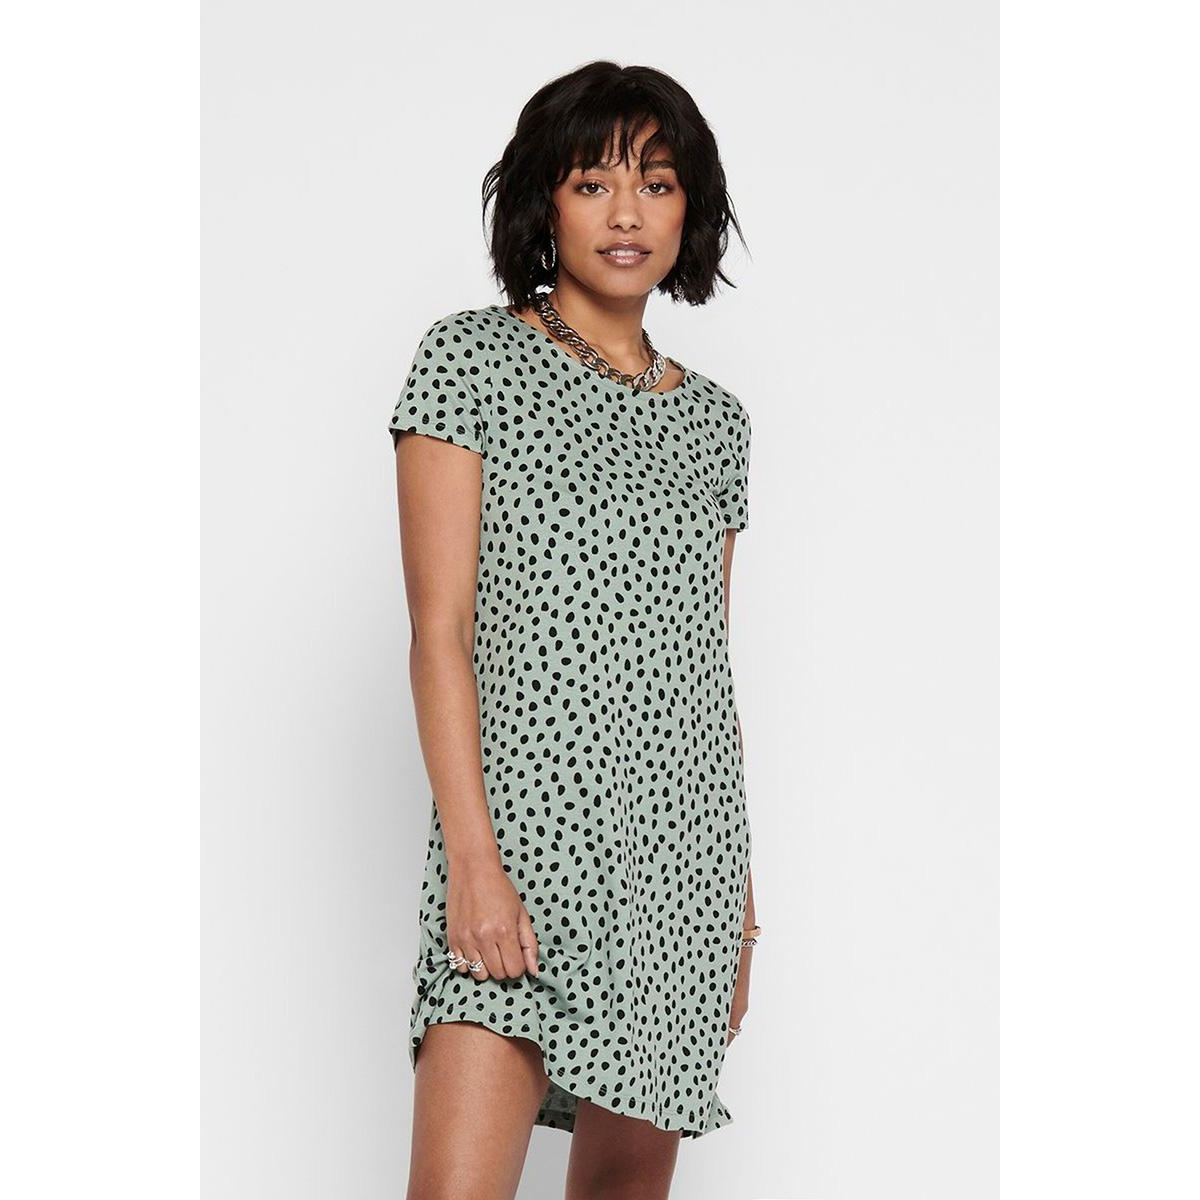 onlbera back lace up s/s dress jrs 15131237 only jurk chinois green/black dots